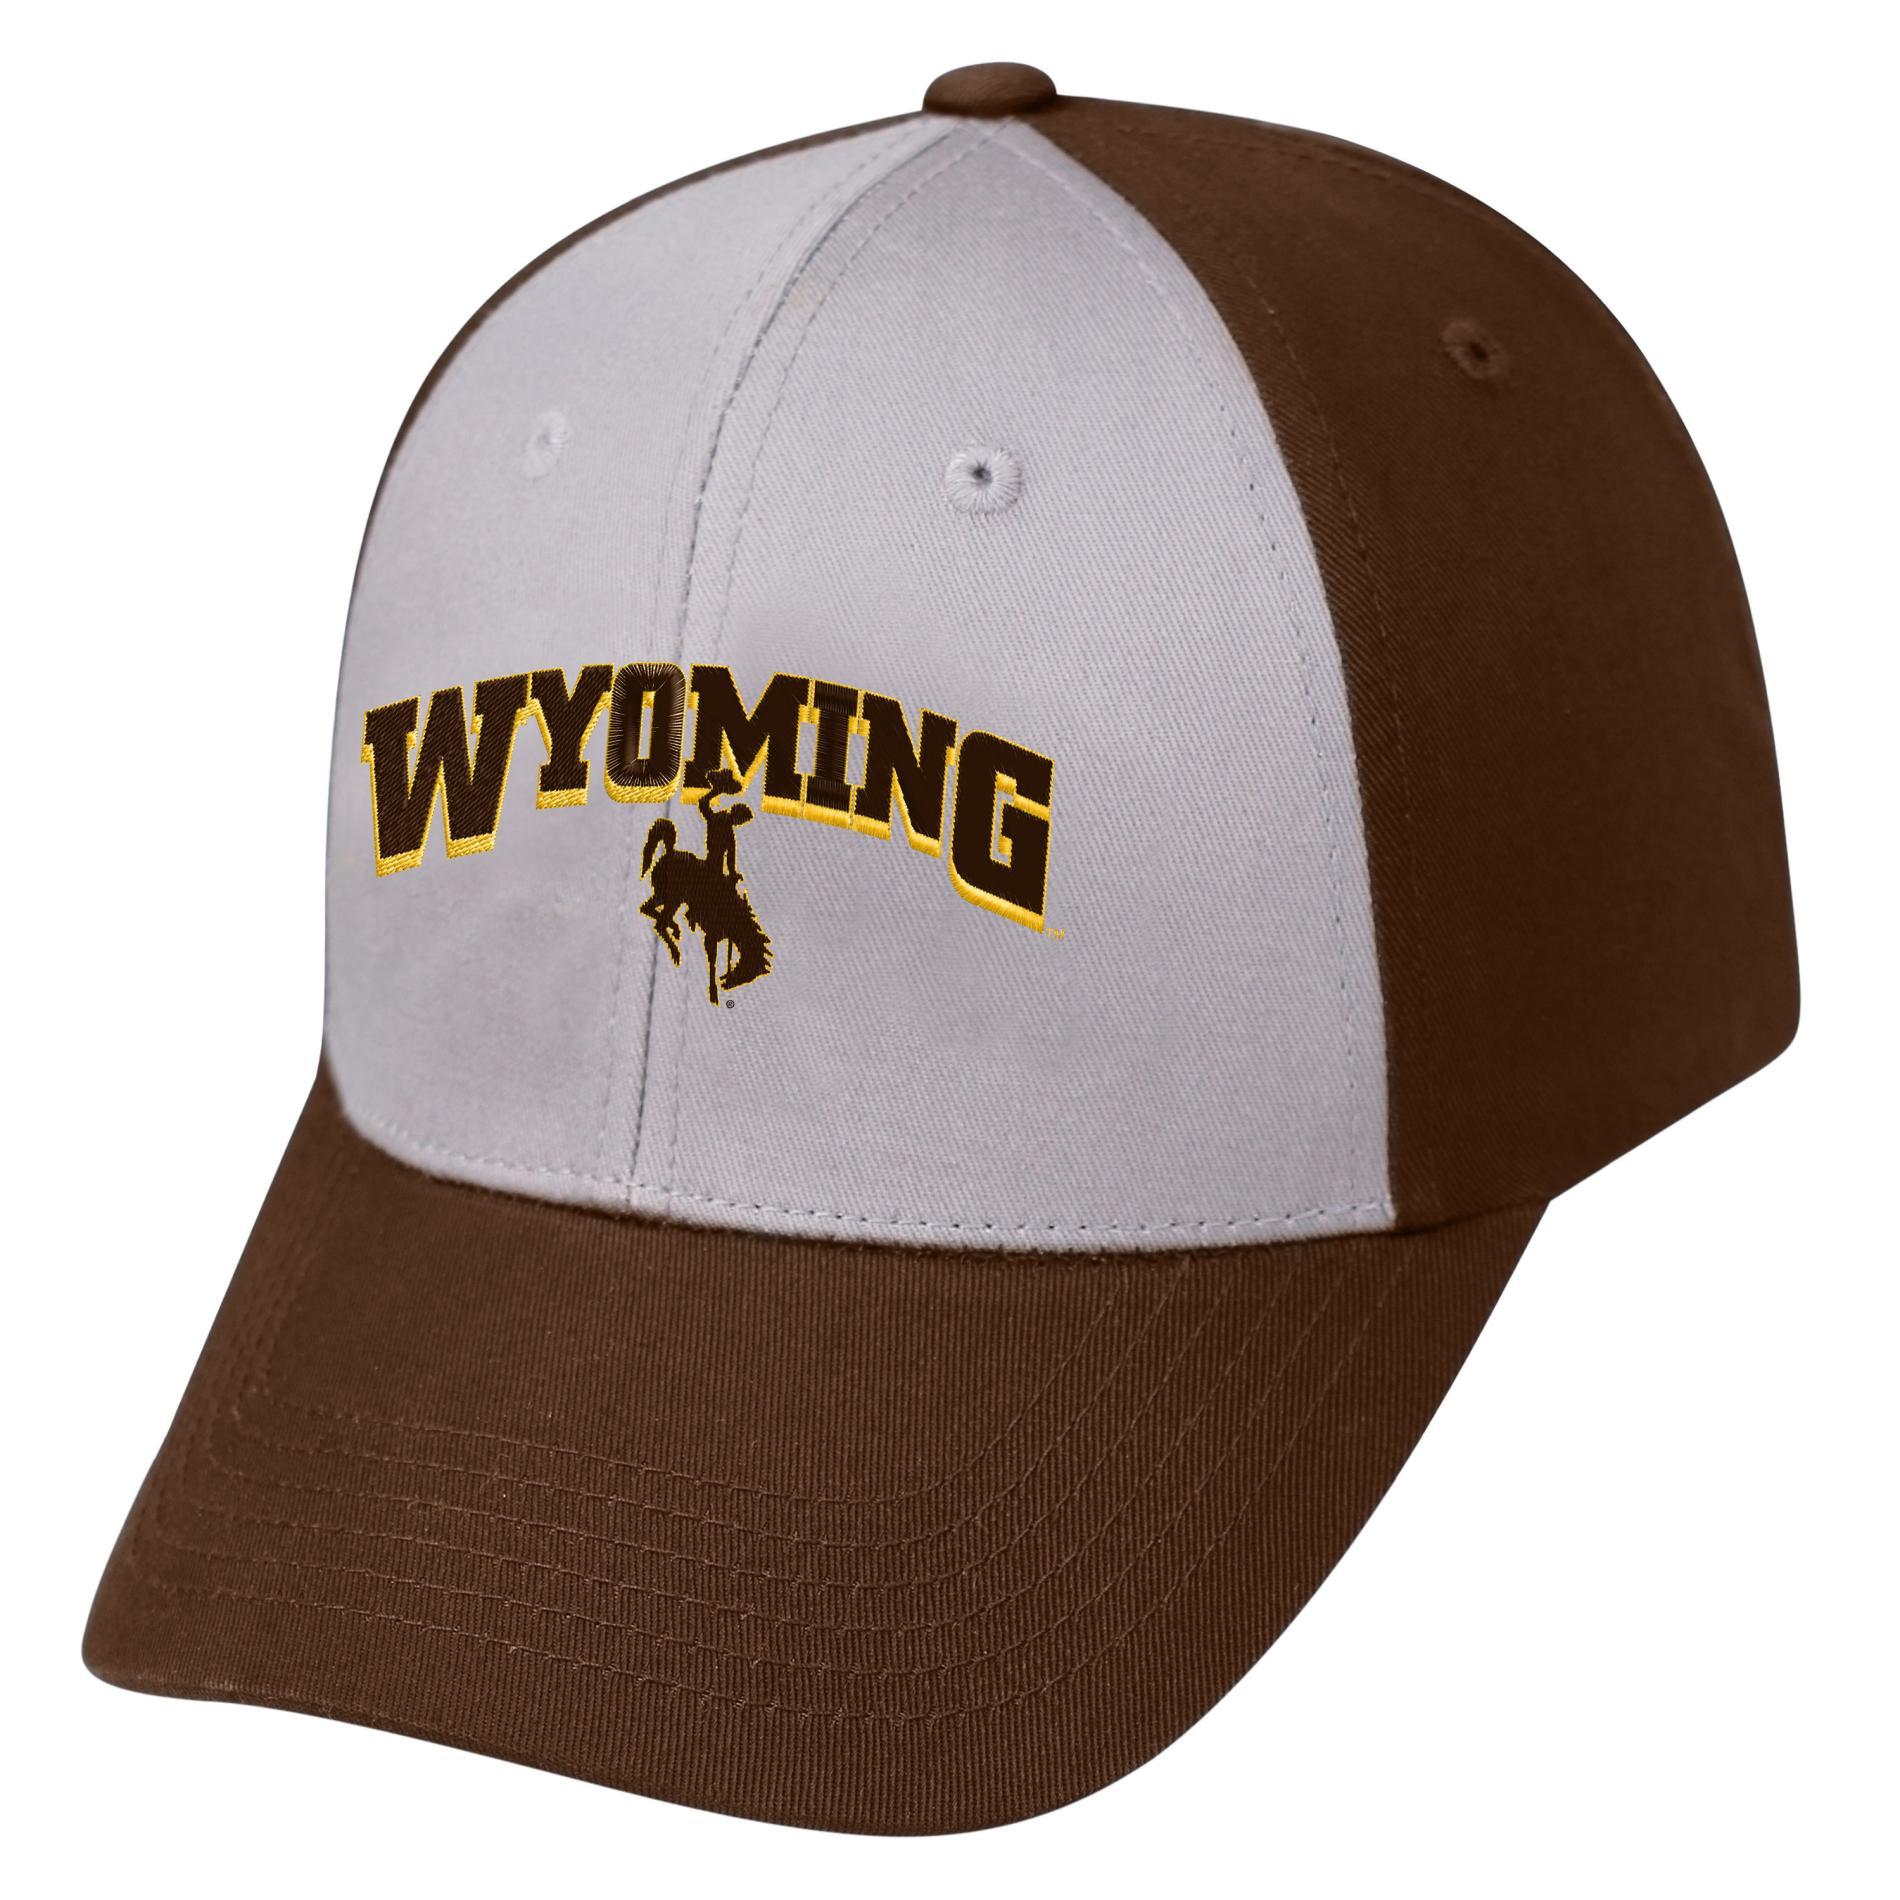 Wyoming Cowboys New Era Baseball Caps - Year of Clean Water